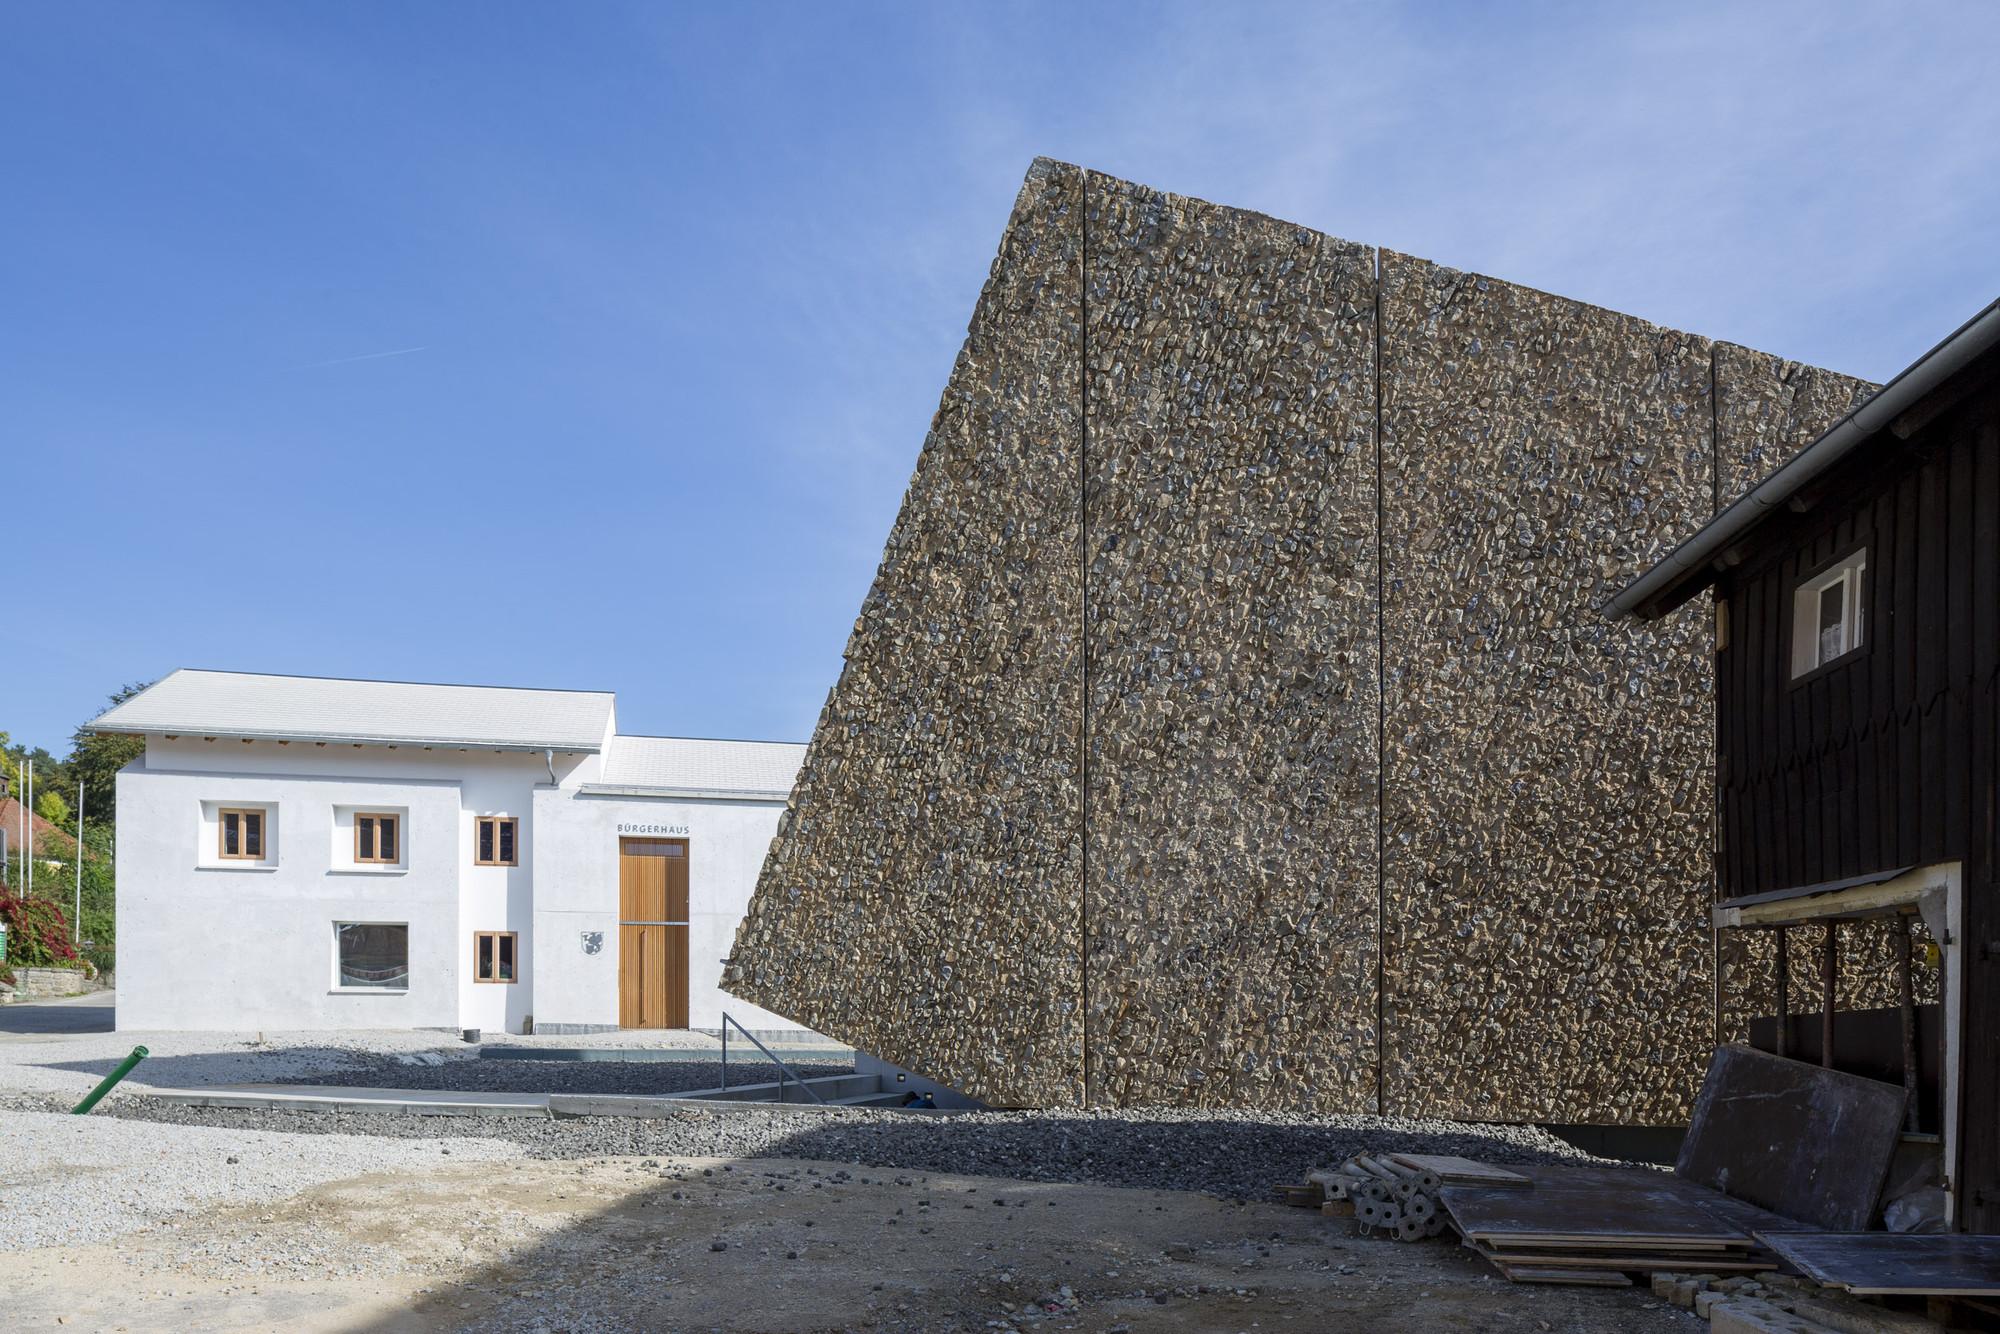 Haimerl Architektur gallery of concert blaibach haimerl architektur 24